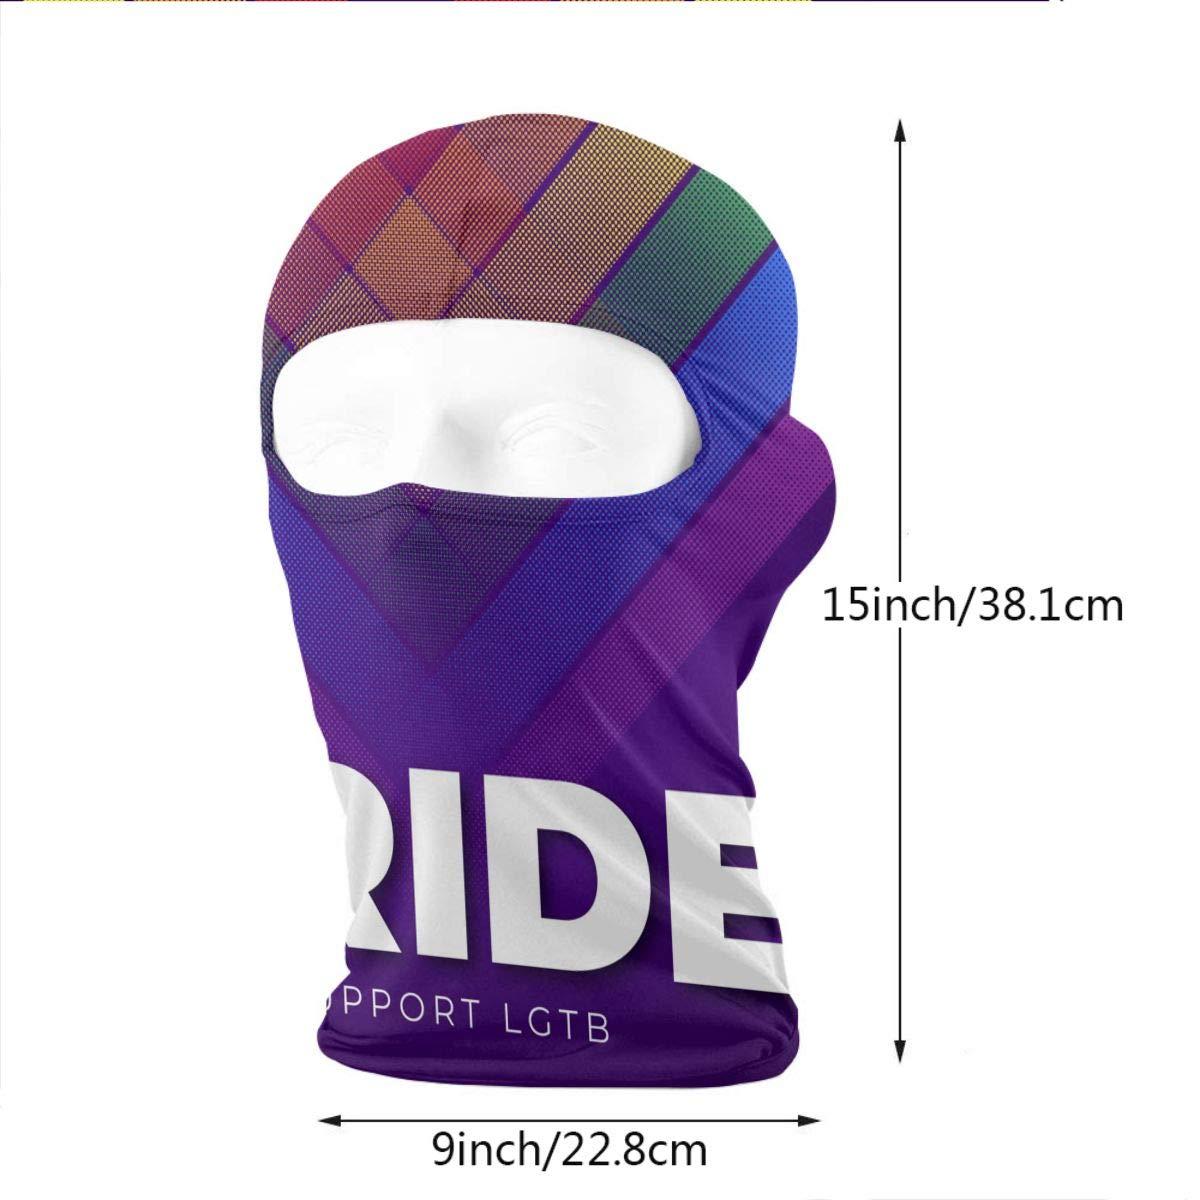 8 LaoJi LGBT Pride Day Winter Ski Mask Balaclava Hood Wind-Resistant Face Mask